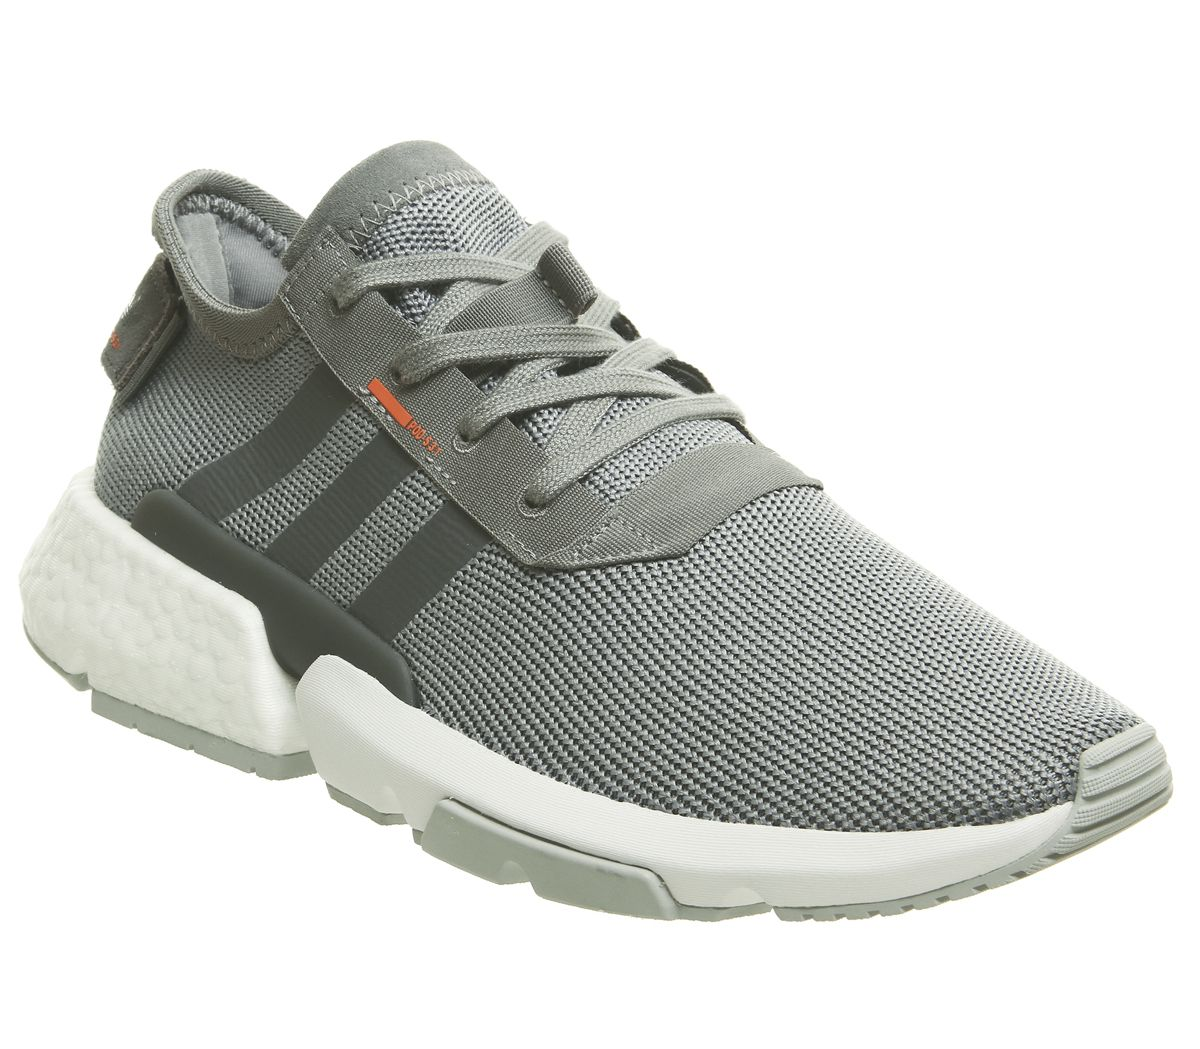 01281c05b6a1 adidas Pod S3.1 Trainers Grey Three Solar Orange - His trainers